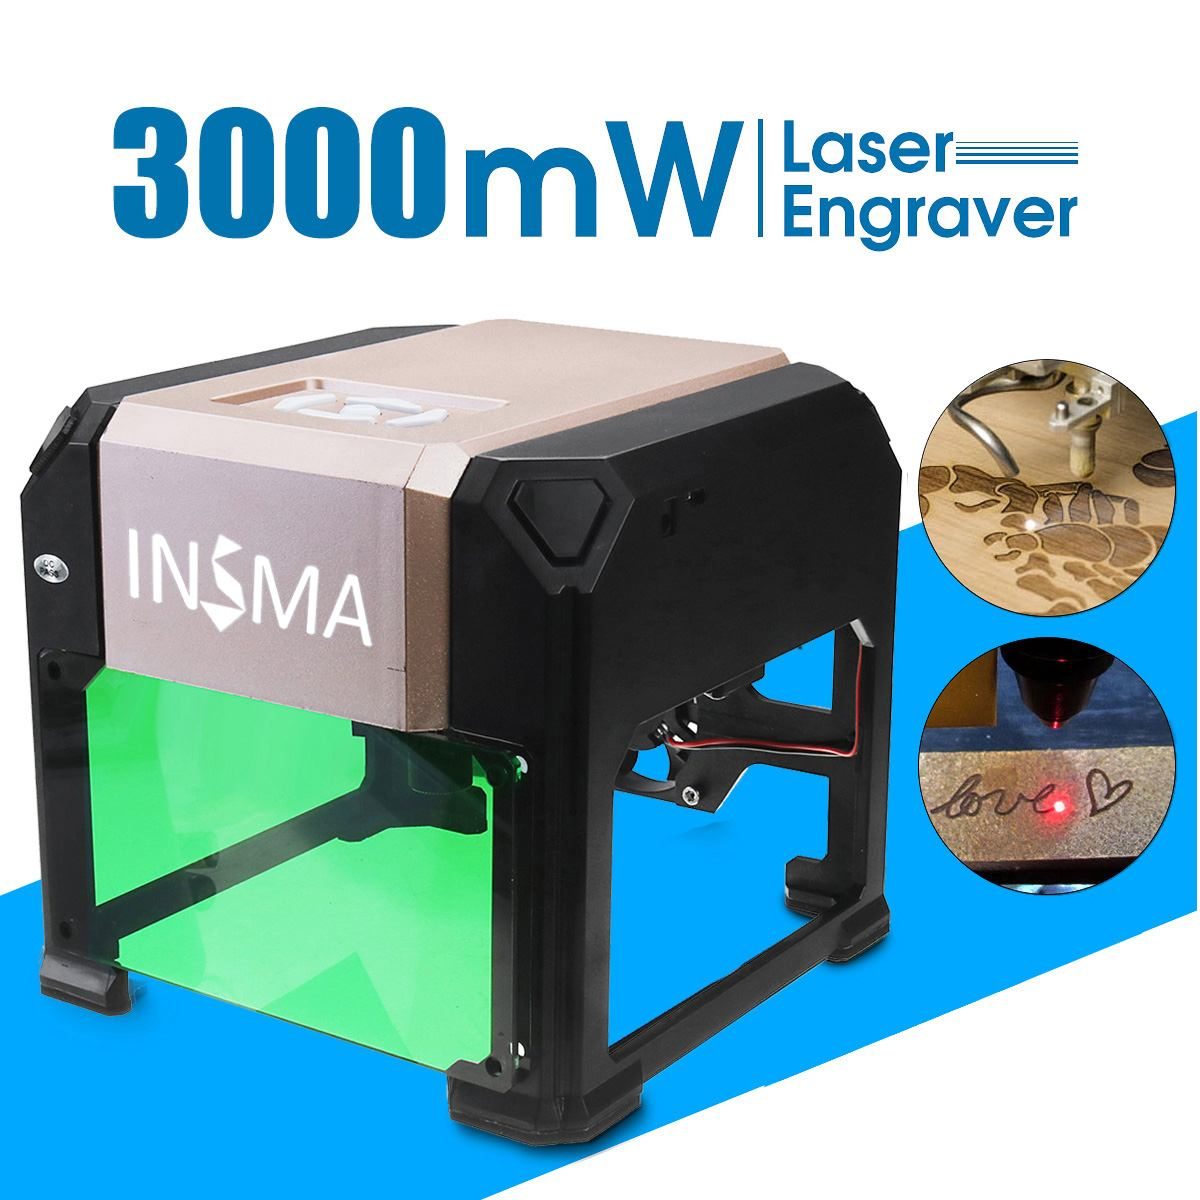 WOLIKE 3000mW Desktop Laser Gravur Maschine USB DIY Logo CNC Laser Engraver Drucker Mit Herz Holz Bord